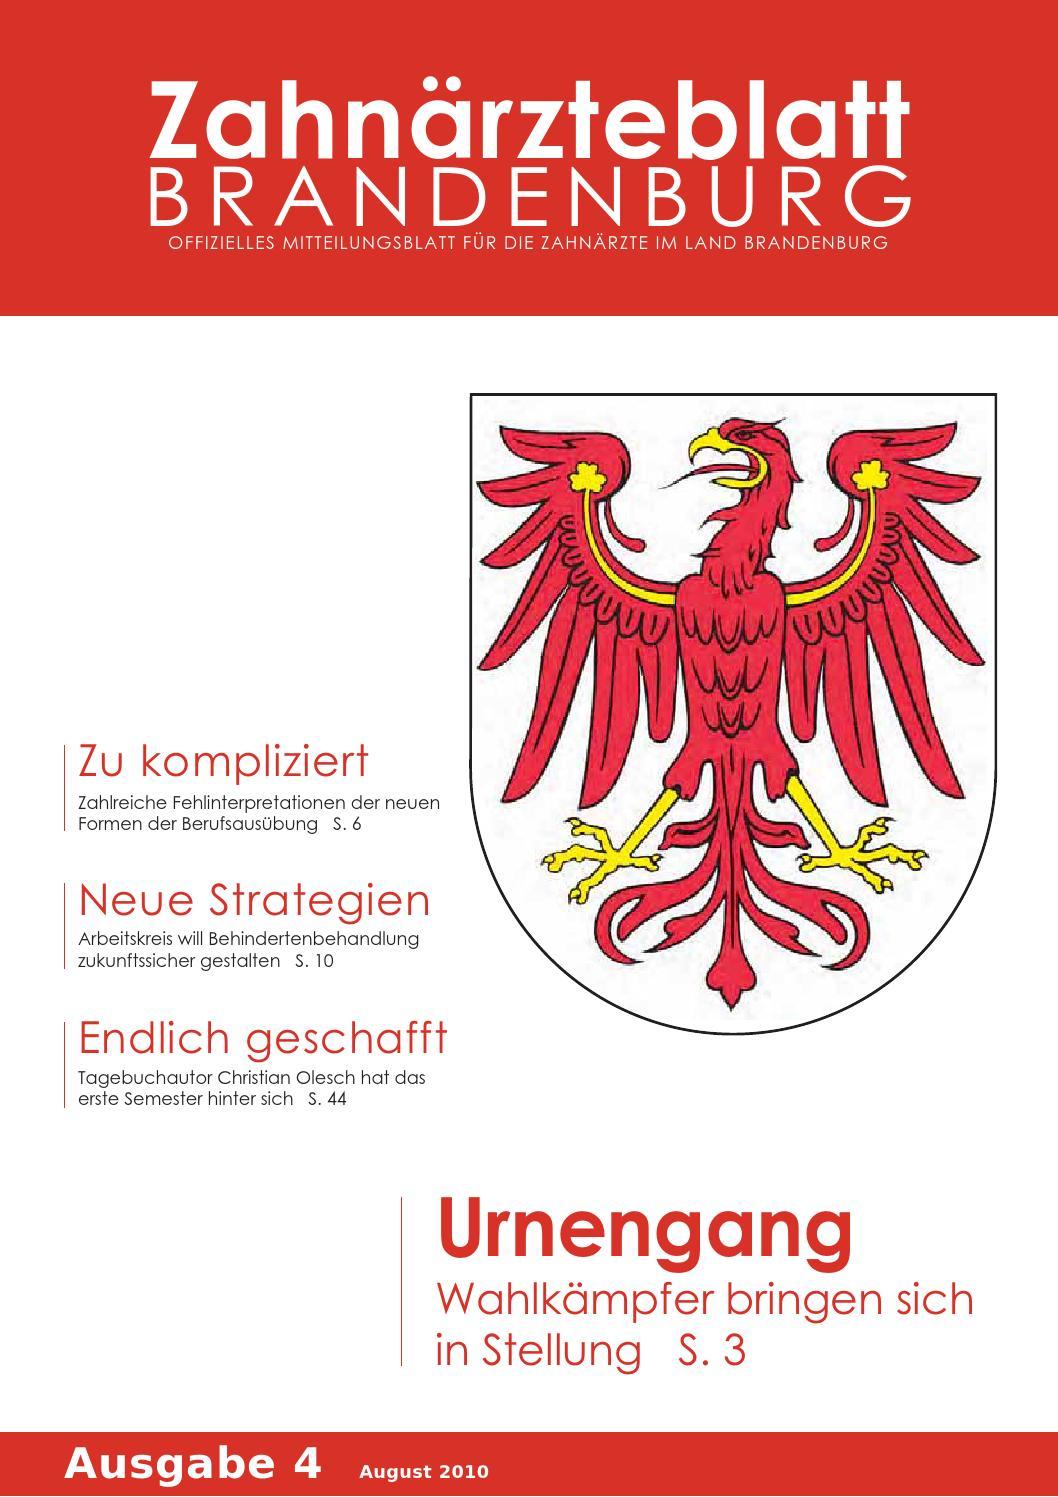 ZBB Ausgabe 4/2010 by KZVLB - issuu